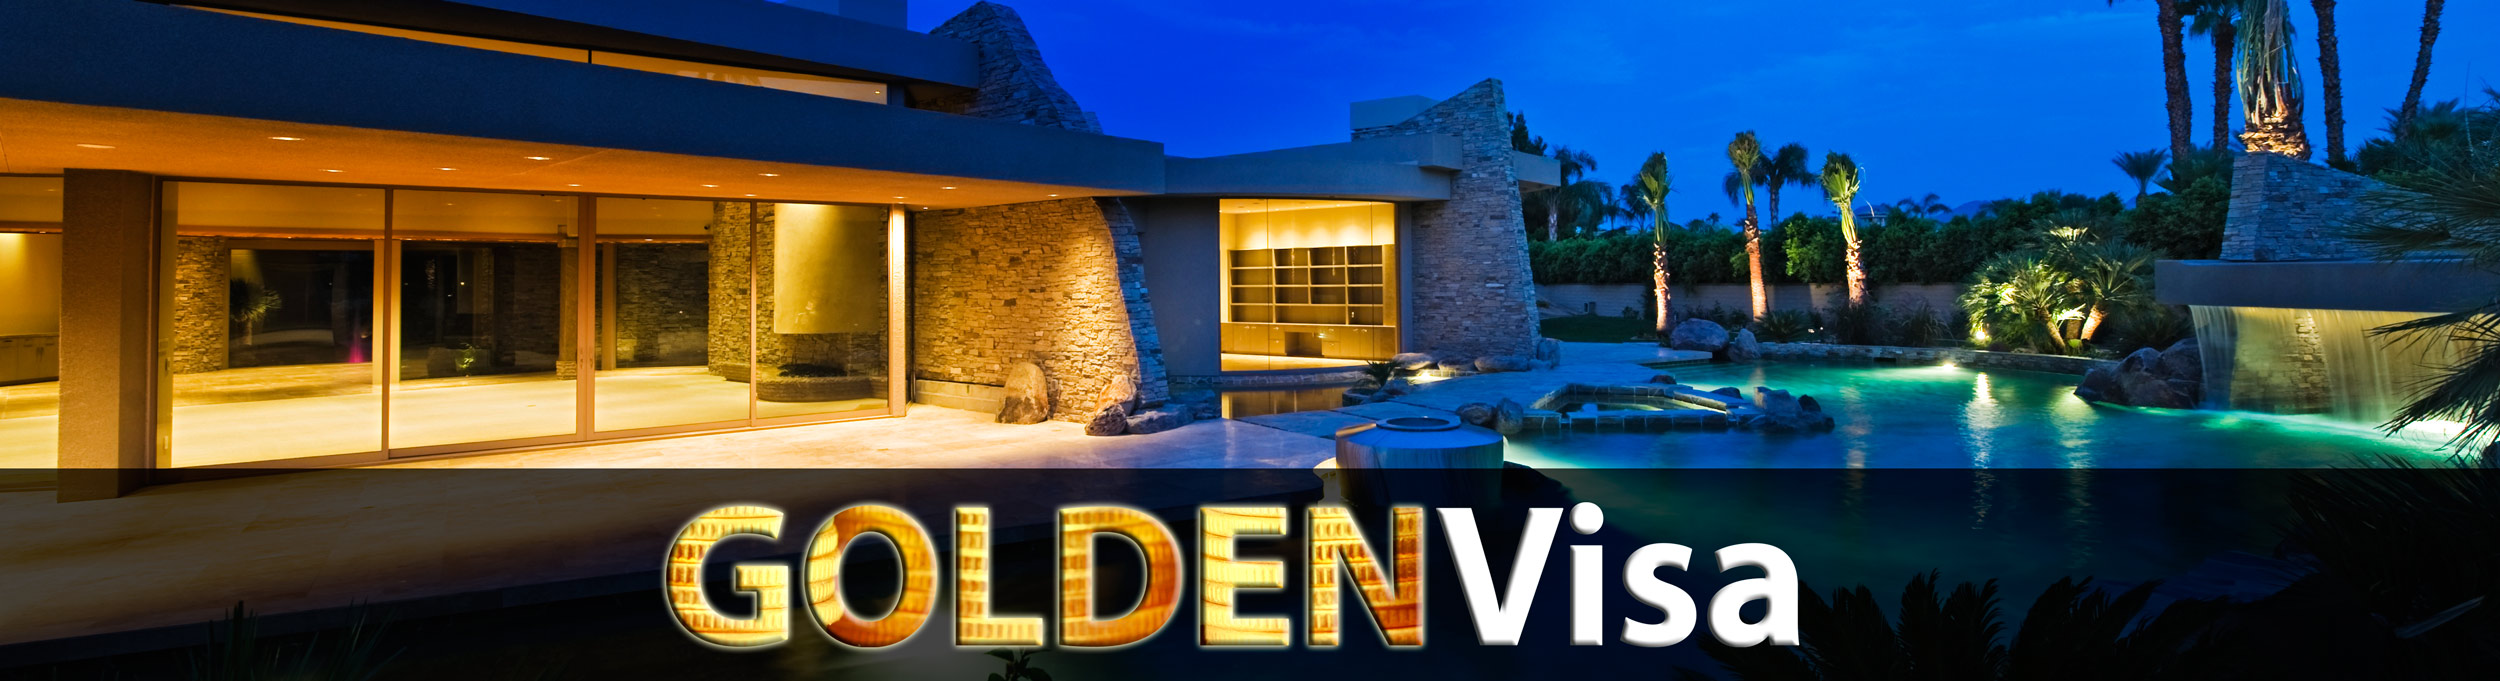 compo-golden-visa-banner-sup-2500